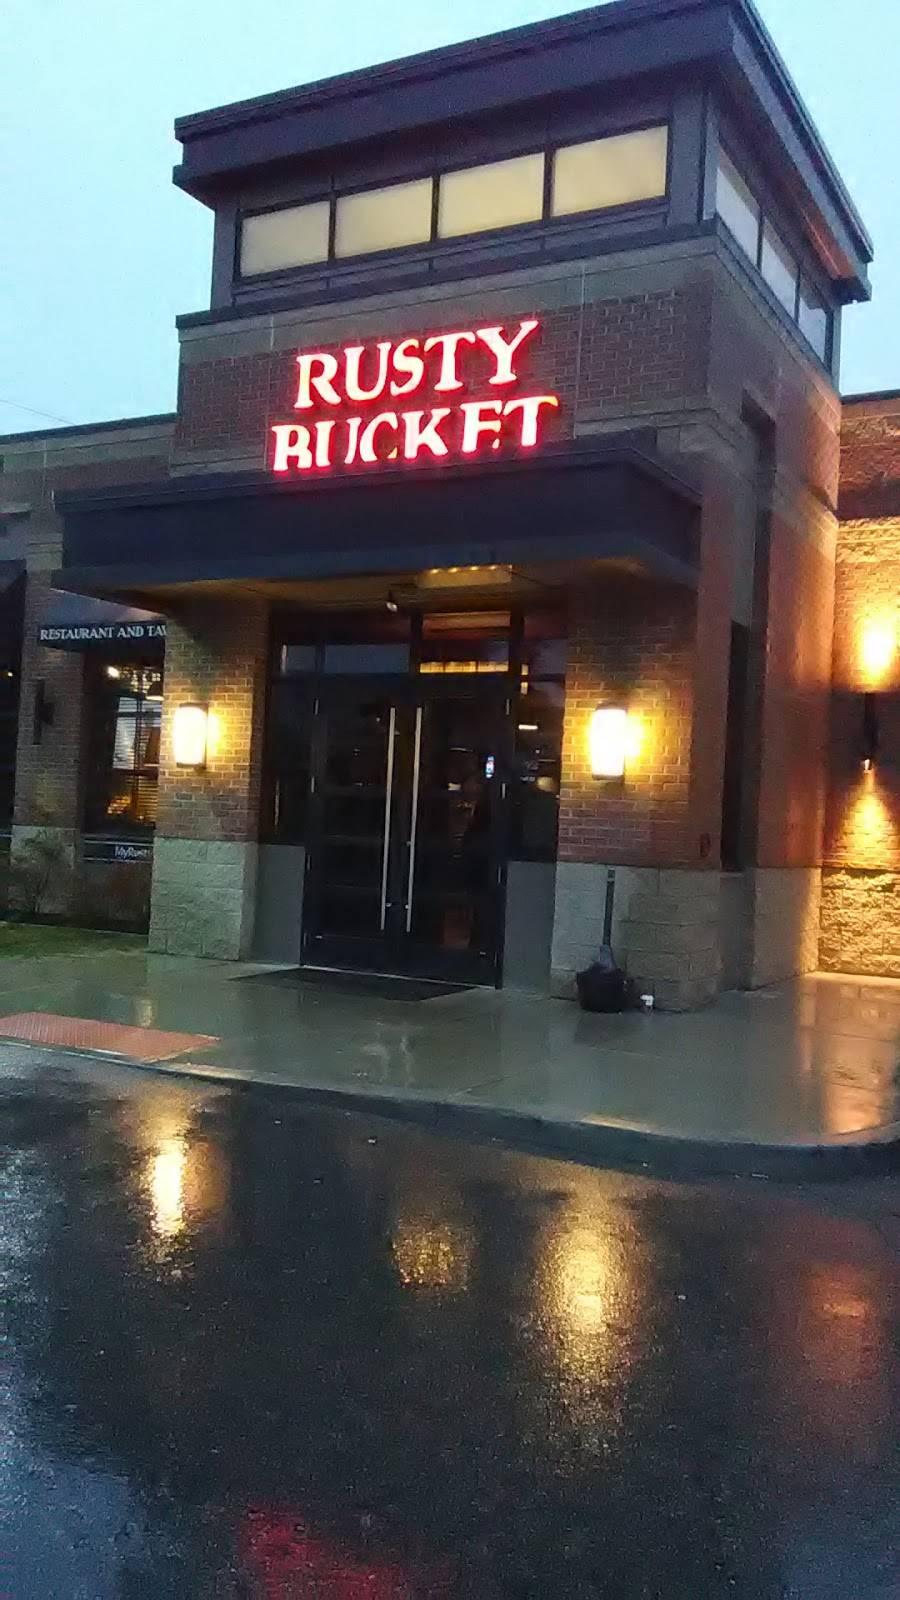 Rusty Bucket Restaurant And Tavern 30450 Telegraph Rd Bingham Farms Mi 48025 Usa